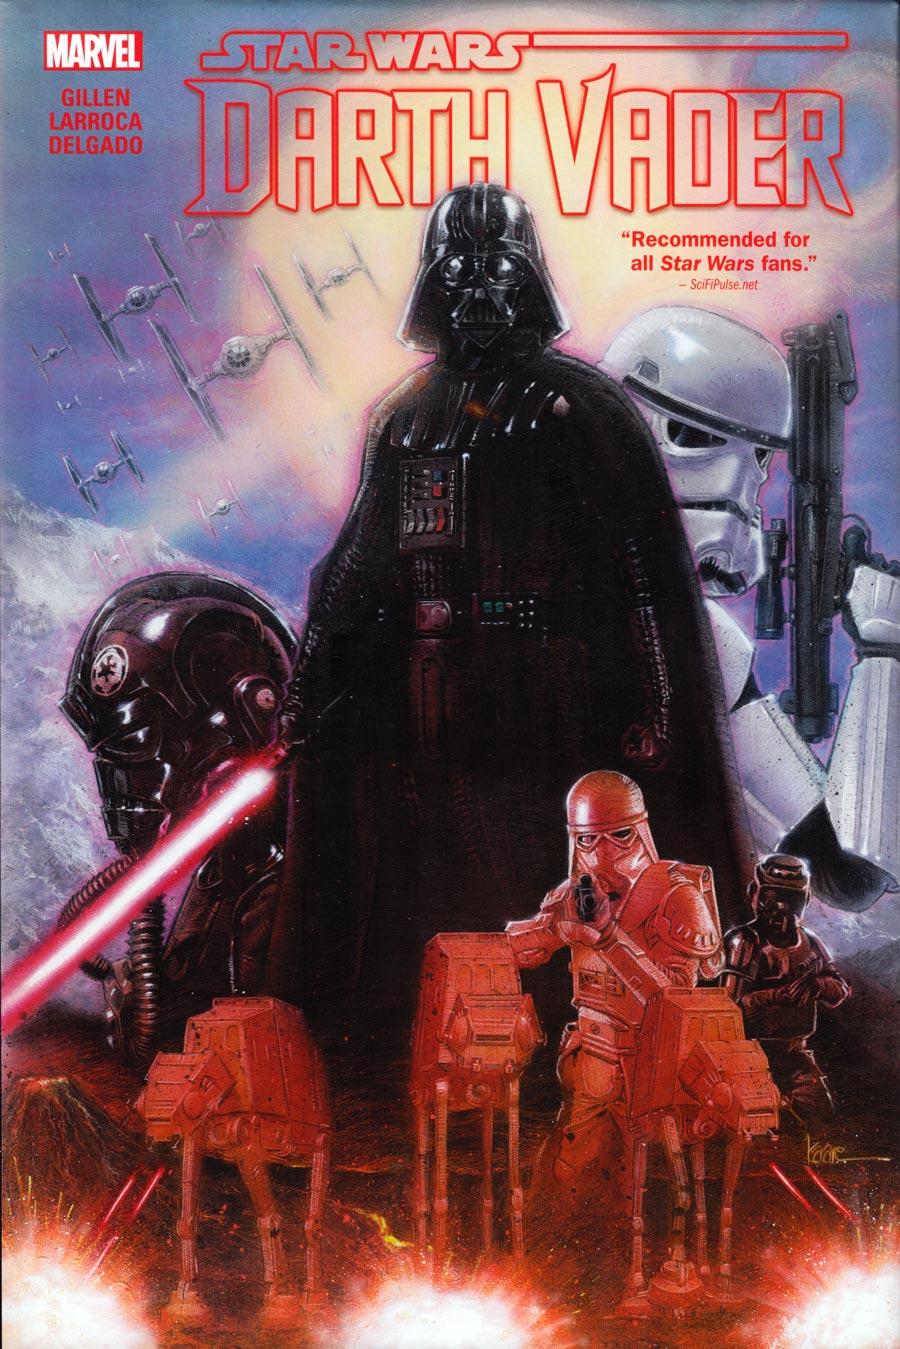 Star Wars Darth Vader 2015 Wookieepedia Fandom